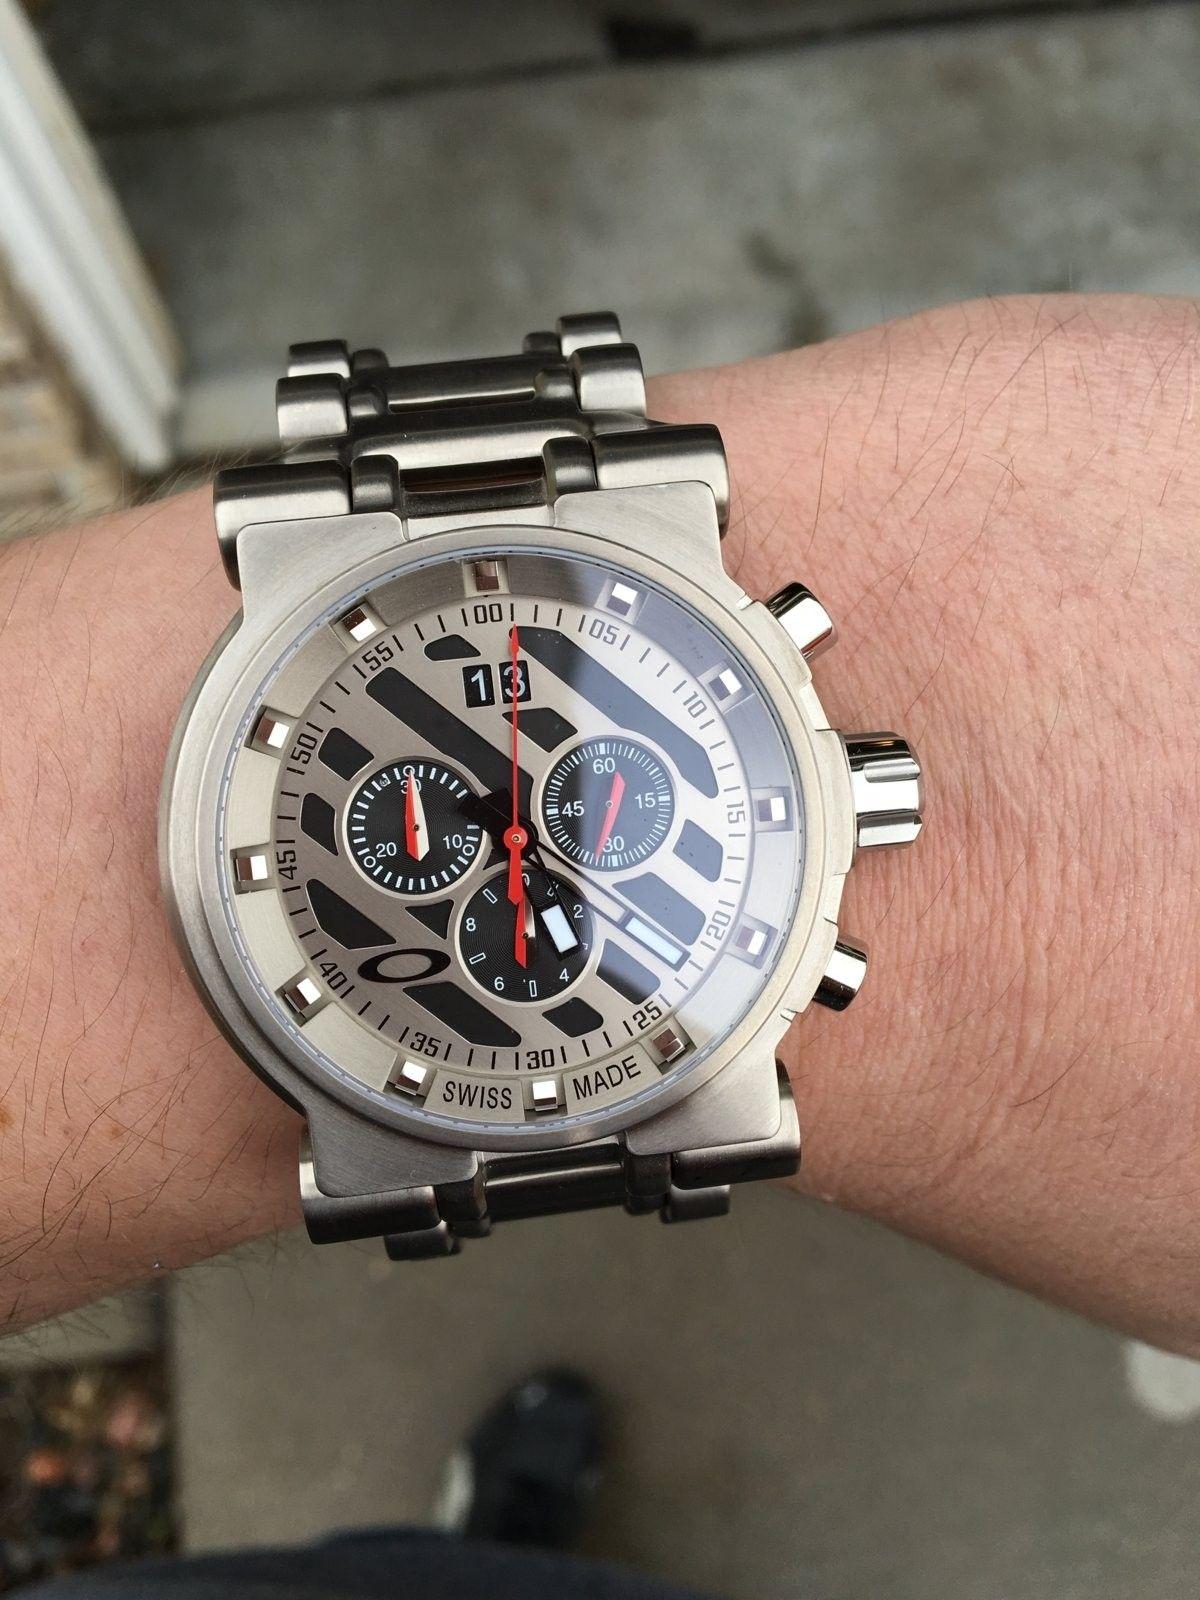 My First Oakley Watch - image.jpeg